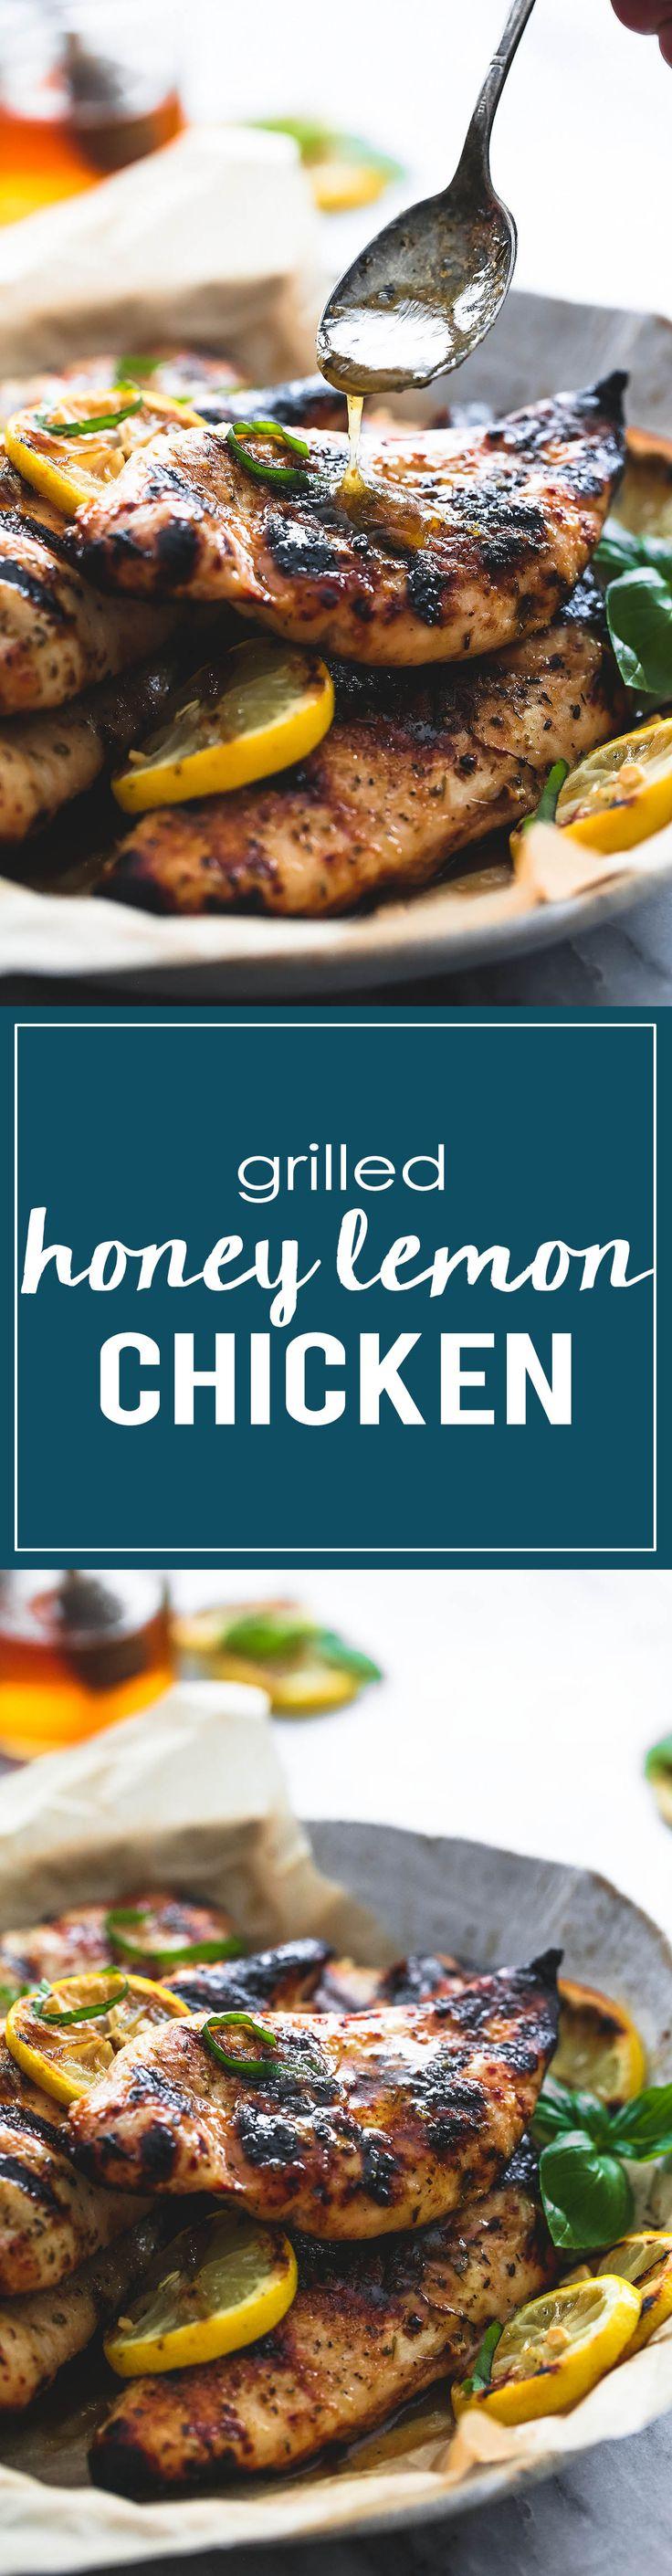 Grilled Honey Lemon Chicken | Creme de la Crumb